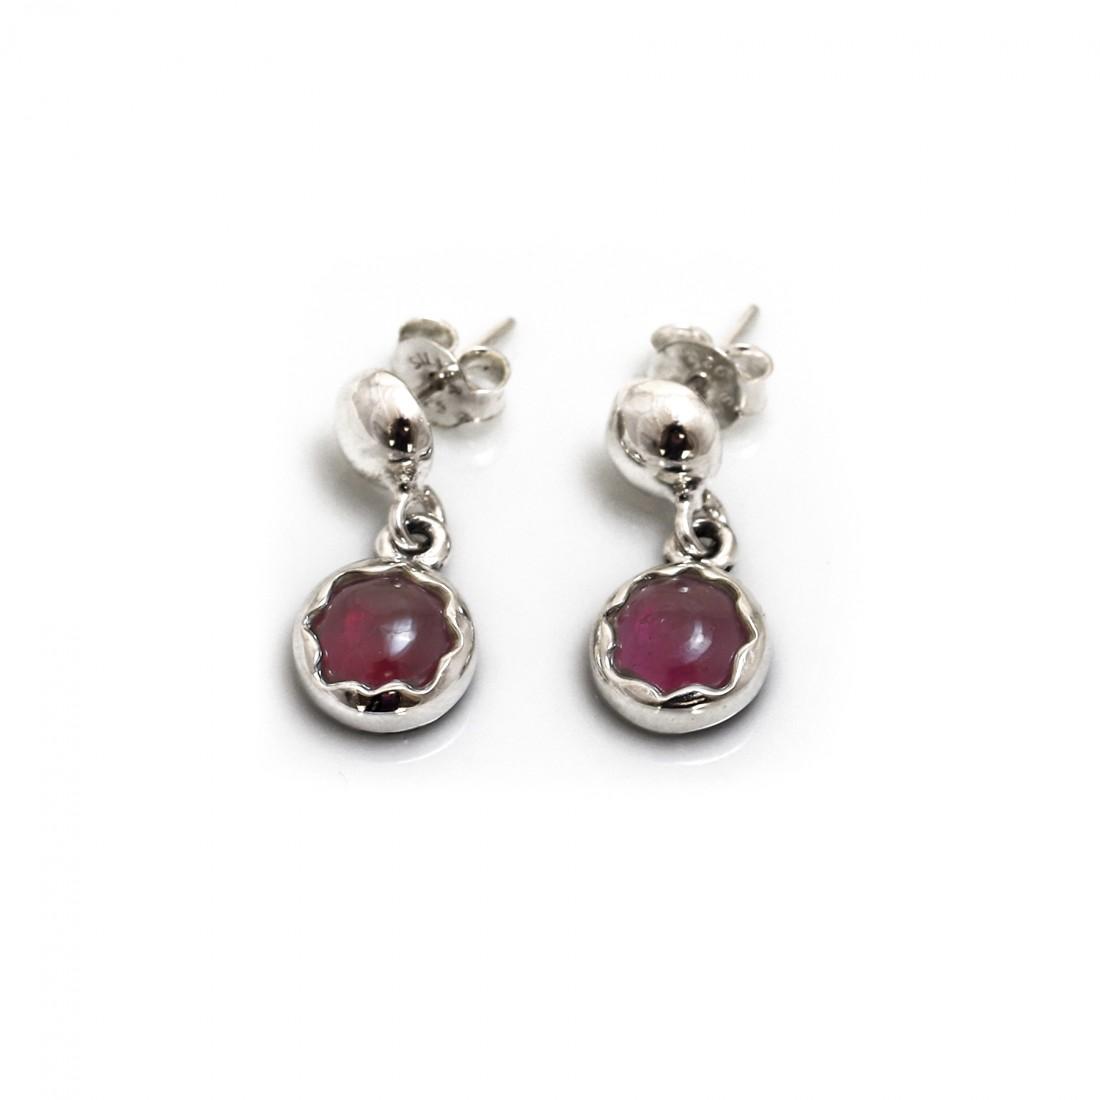 January Birthstone - Sterling Silver & Garnet Dangly Earrings